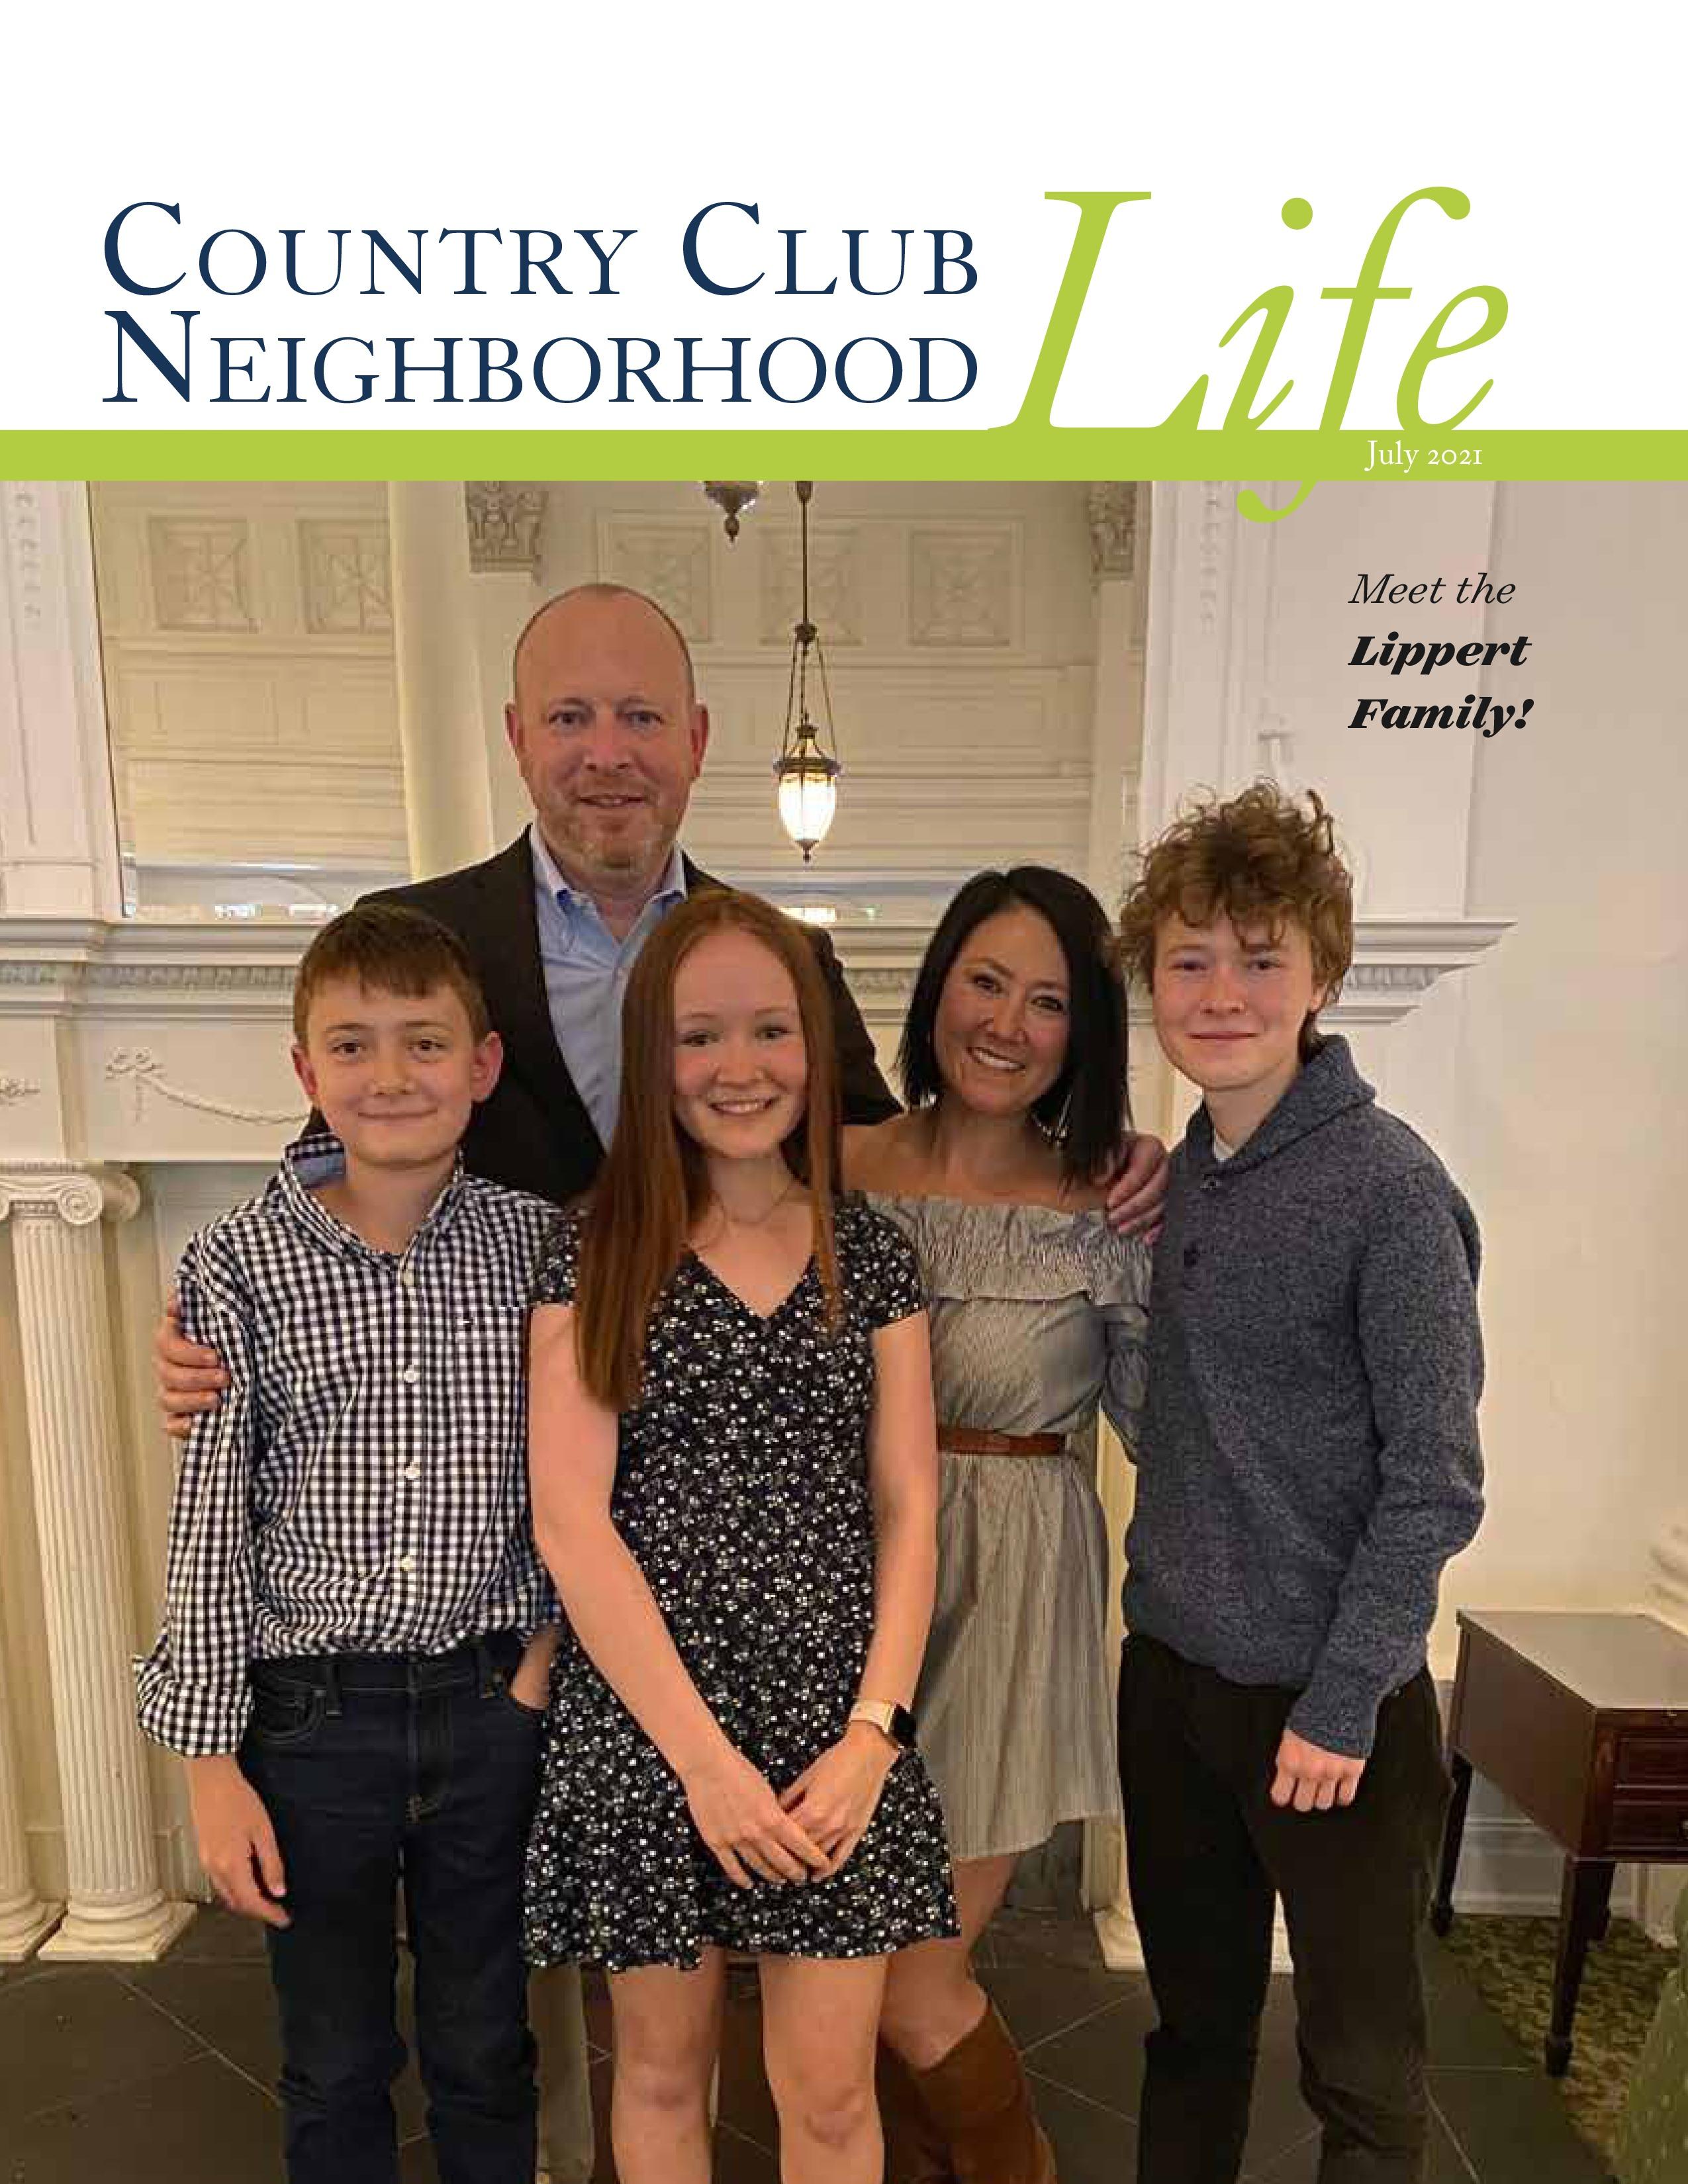 Country Club Neighborhood Life 2021-07-01